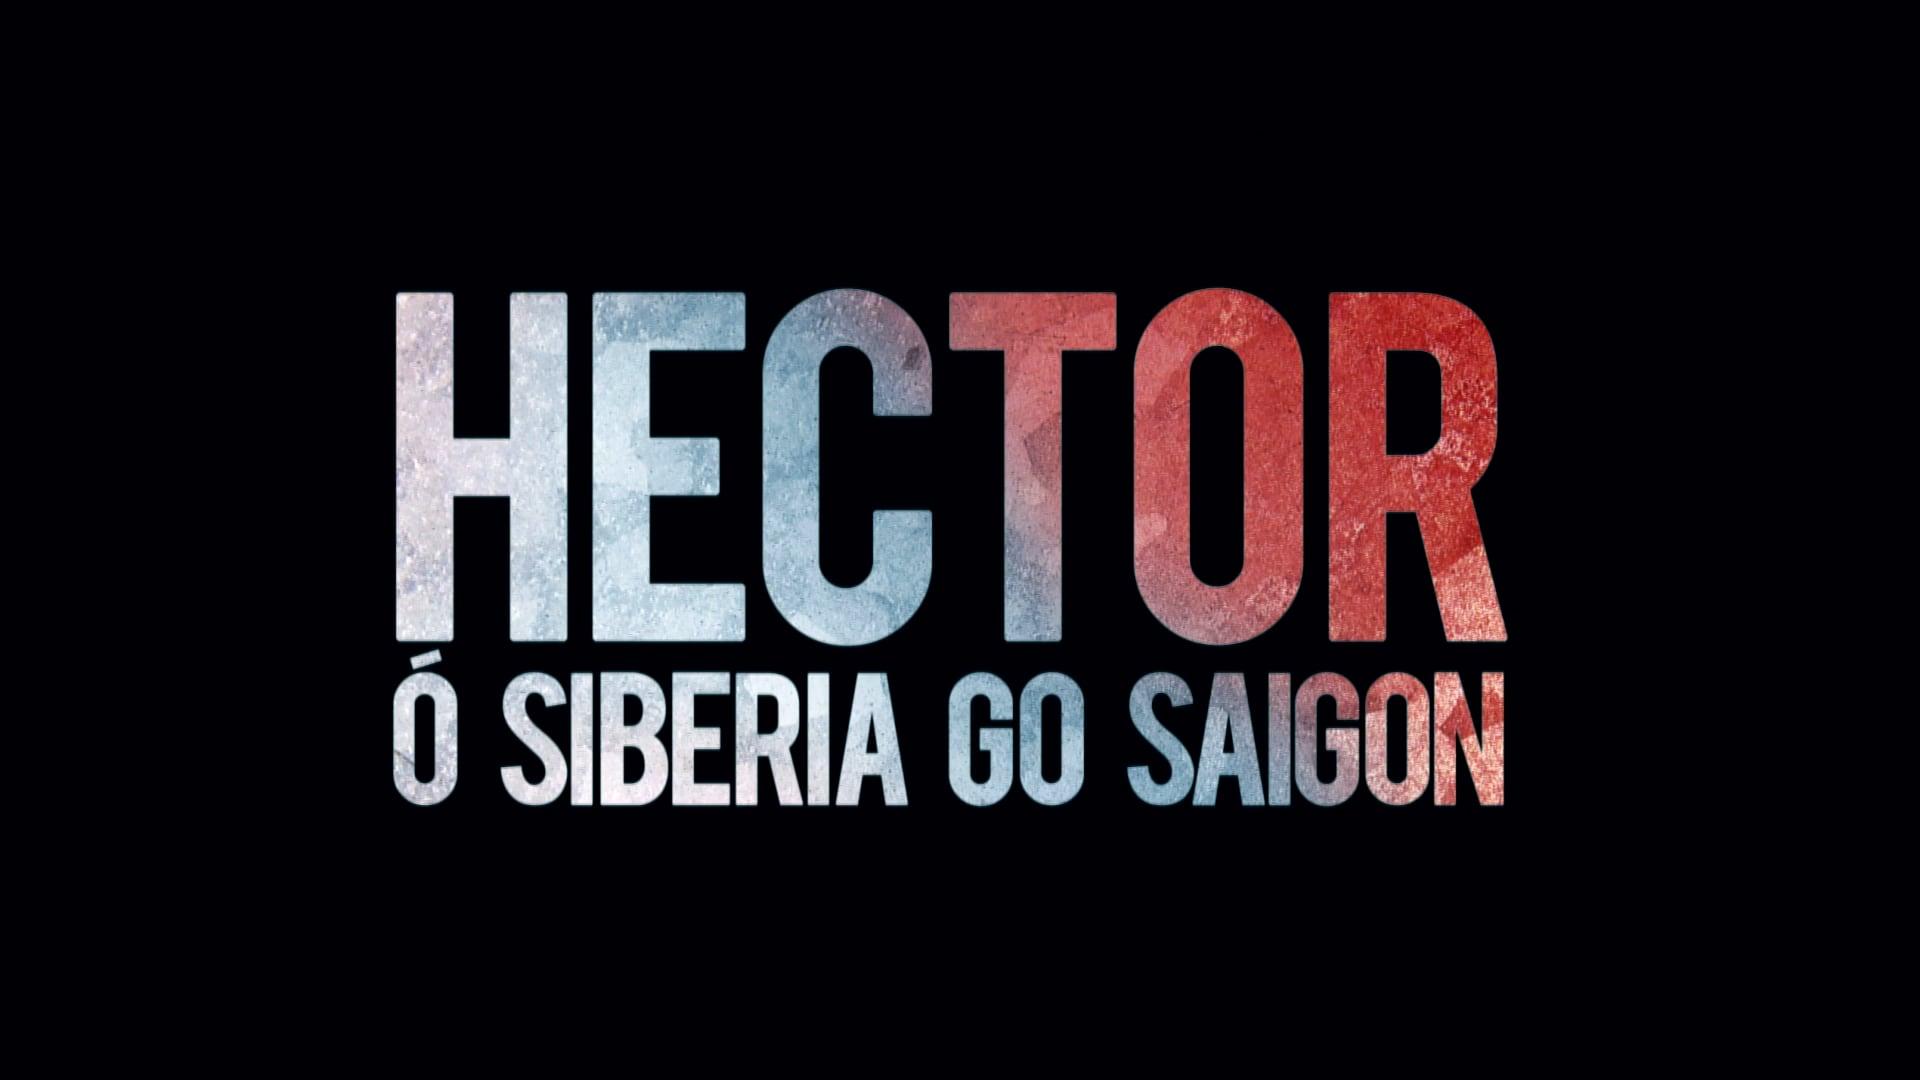 Hector - Ó Siberia go Saigon